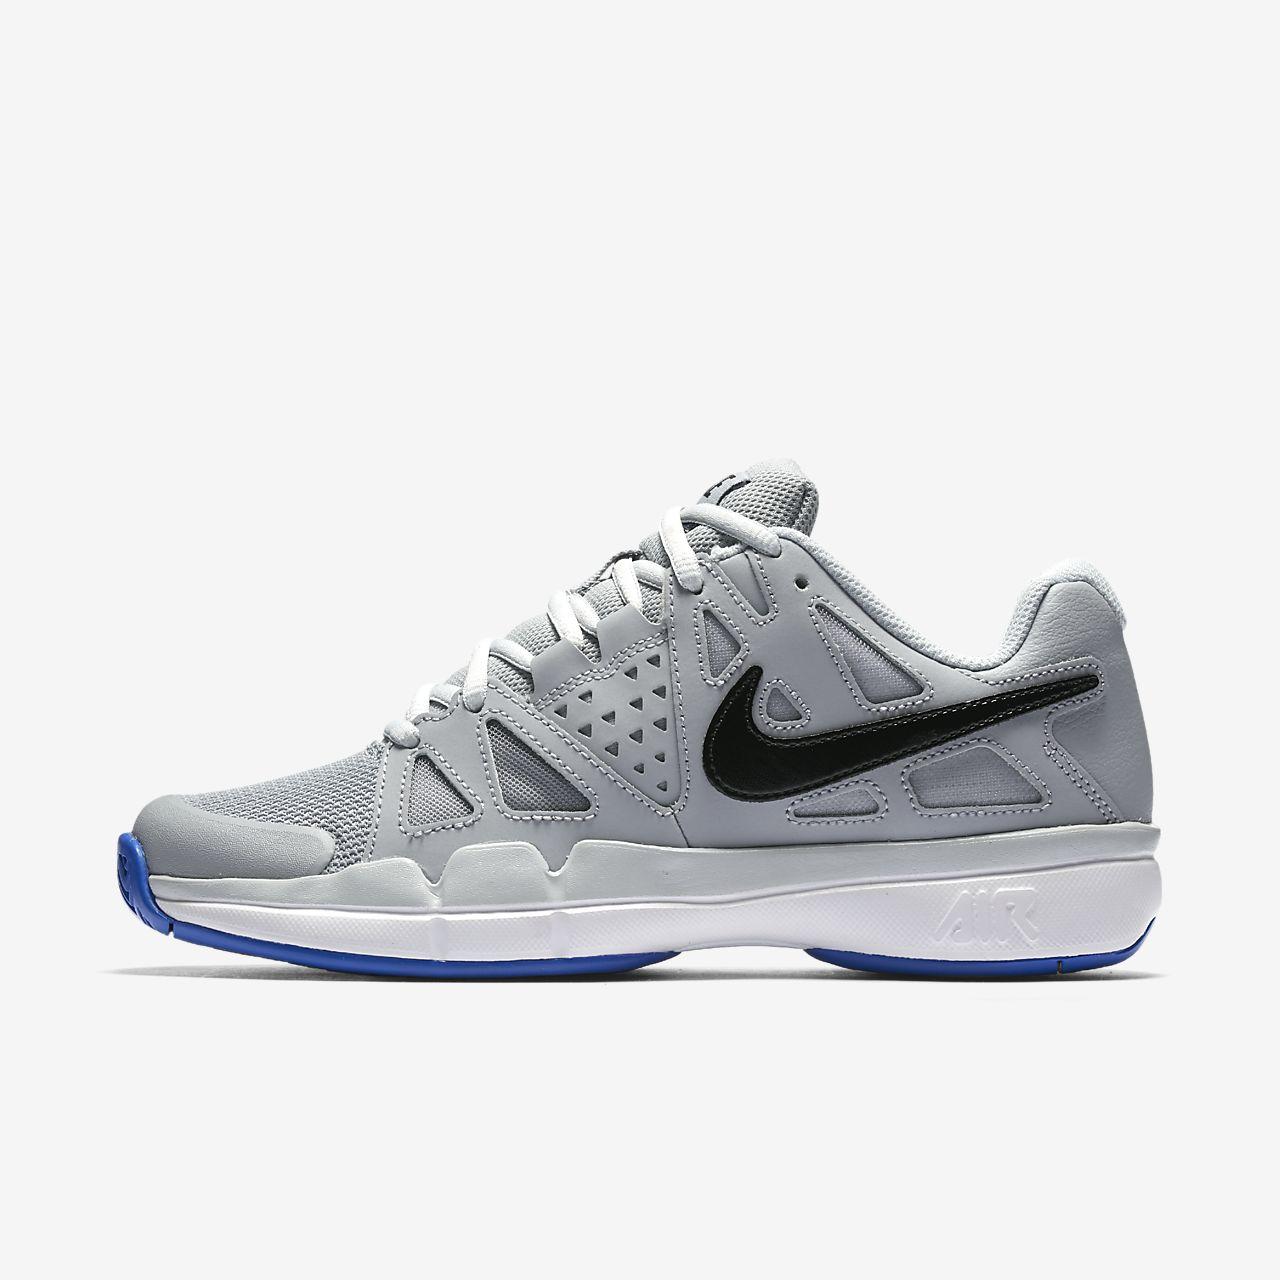 nike chaussures tennis femme